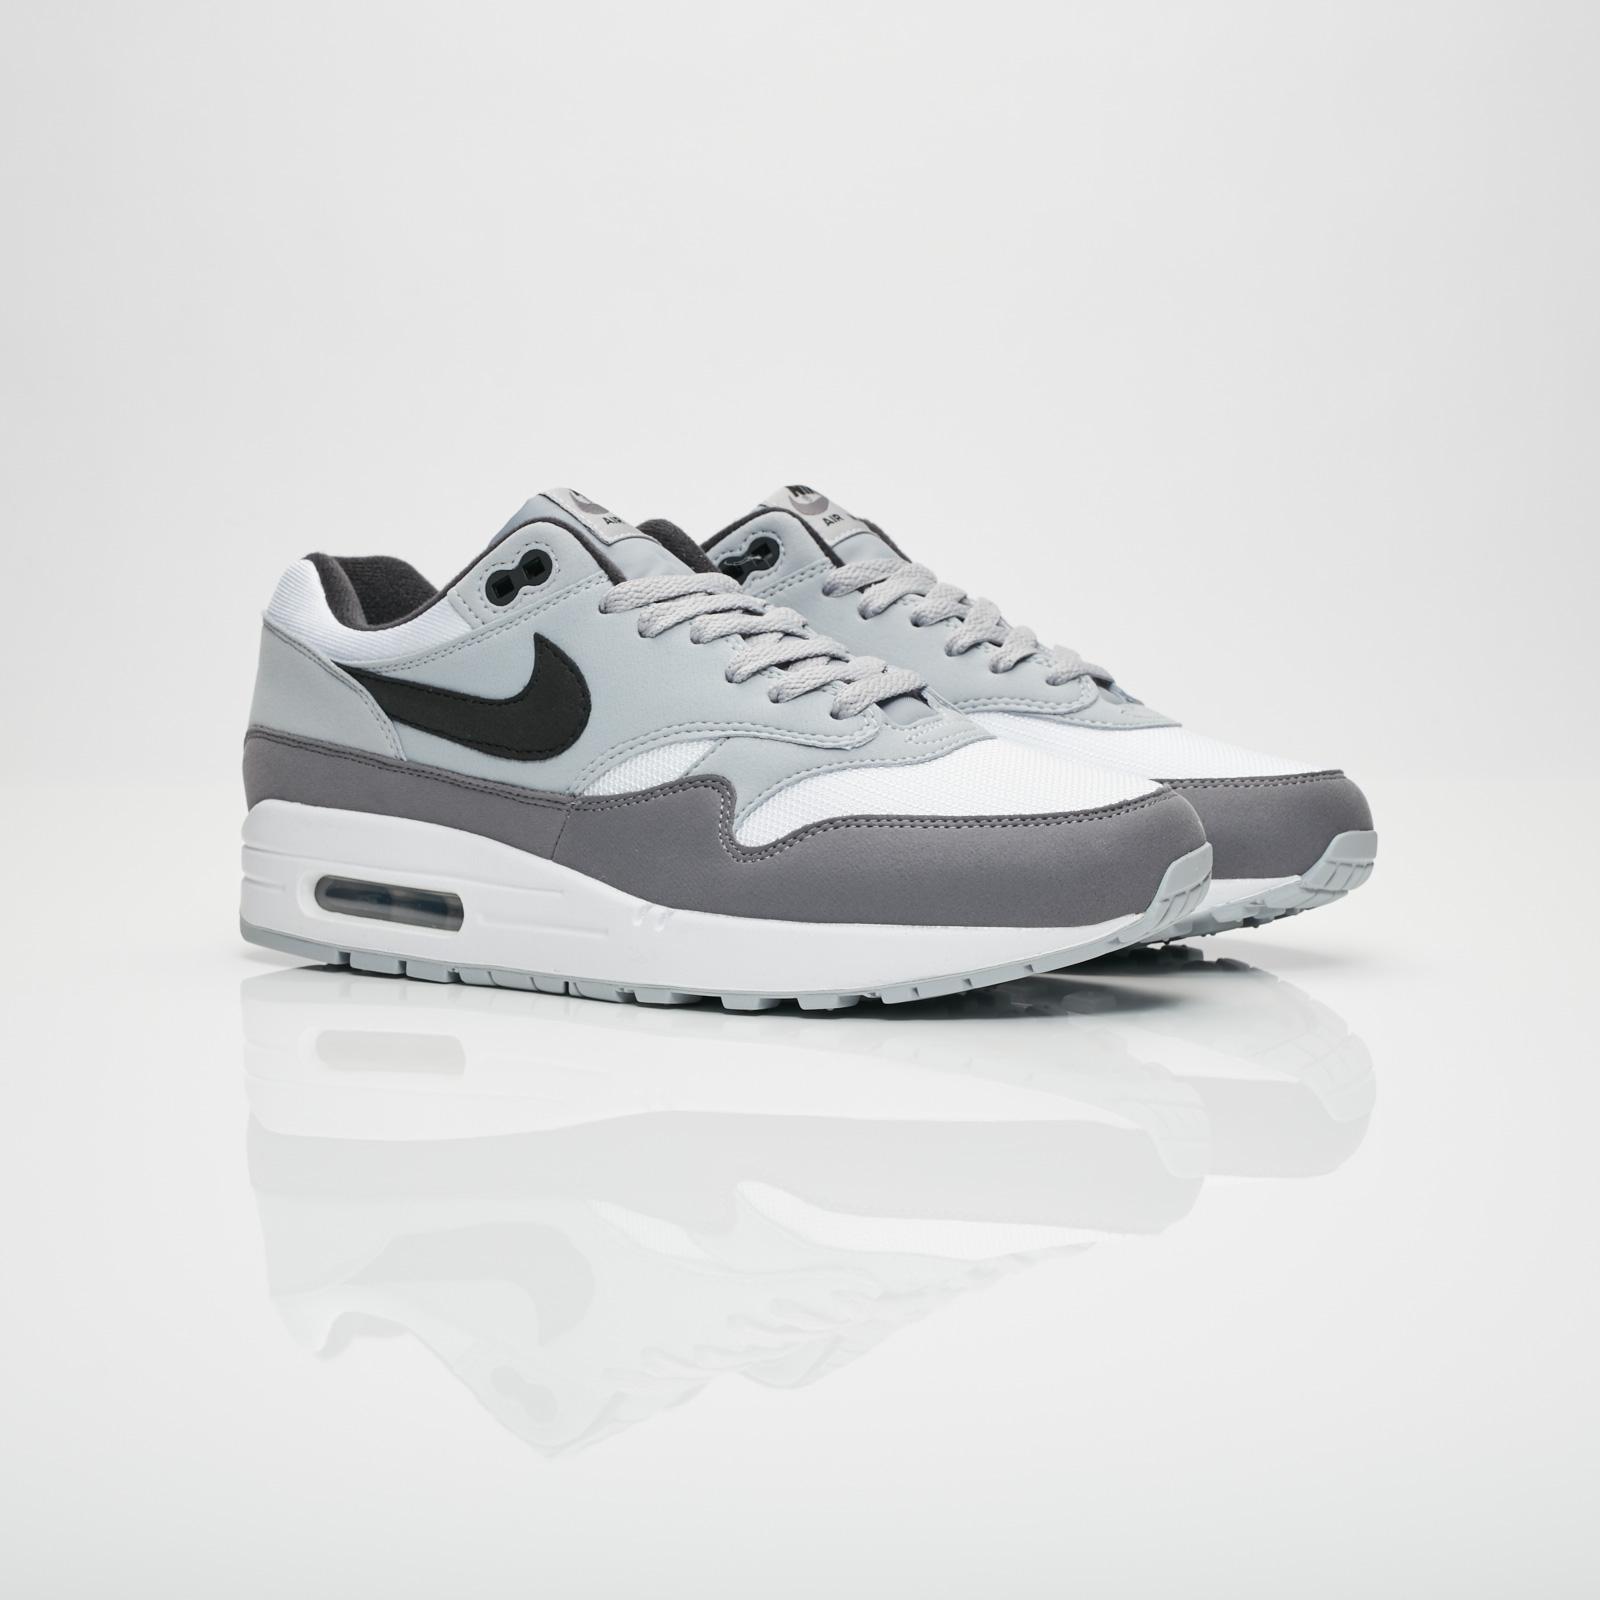 Nike Air Max 1 - Ah8145-101